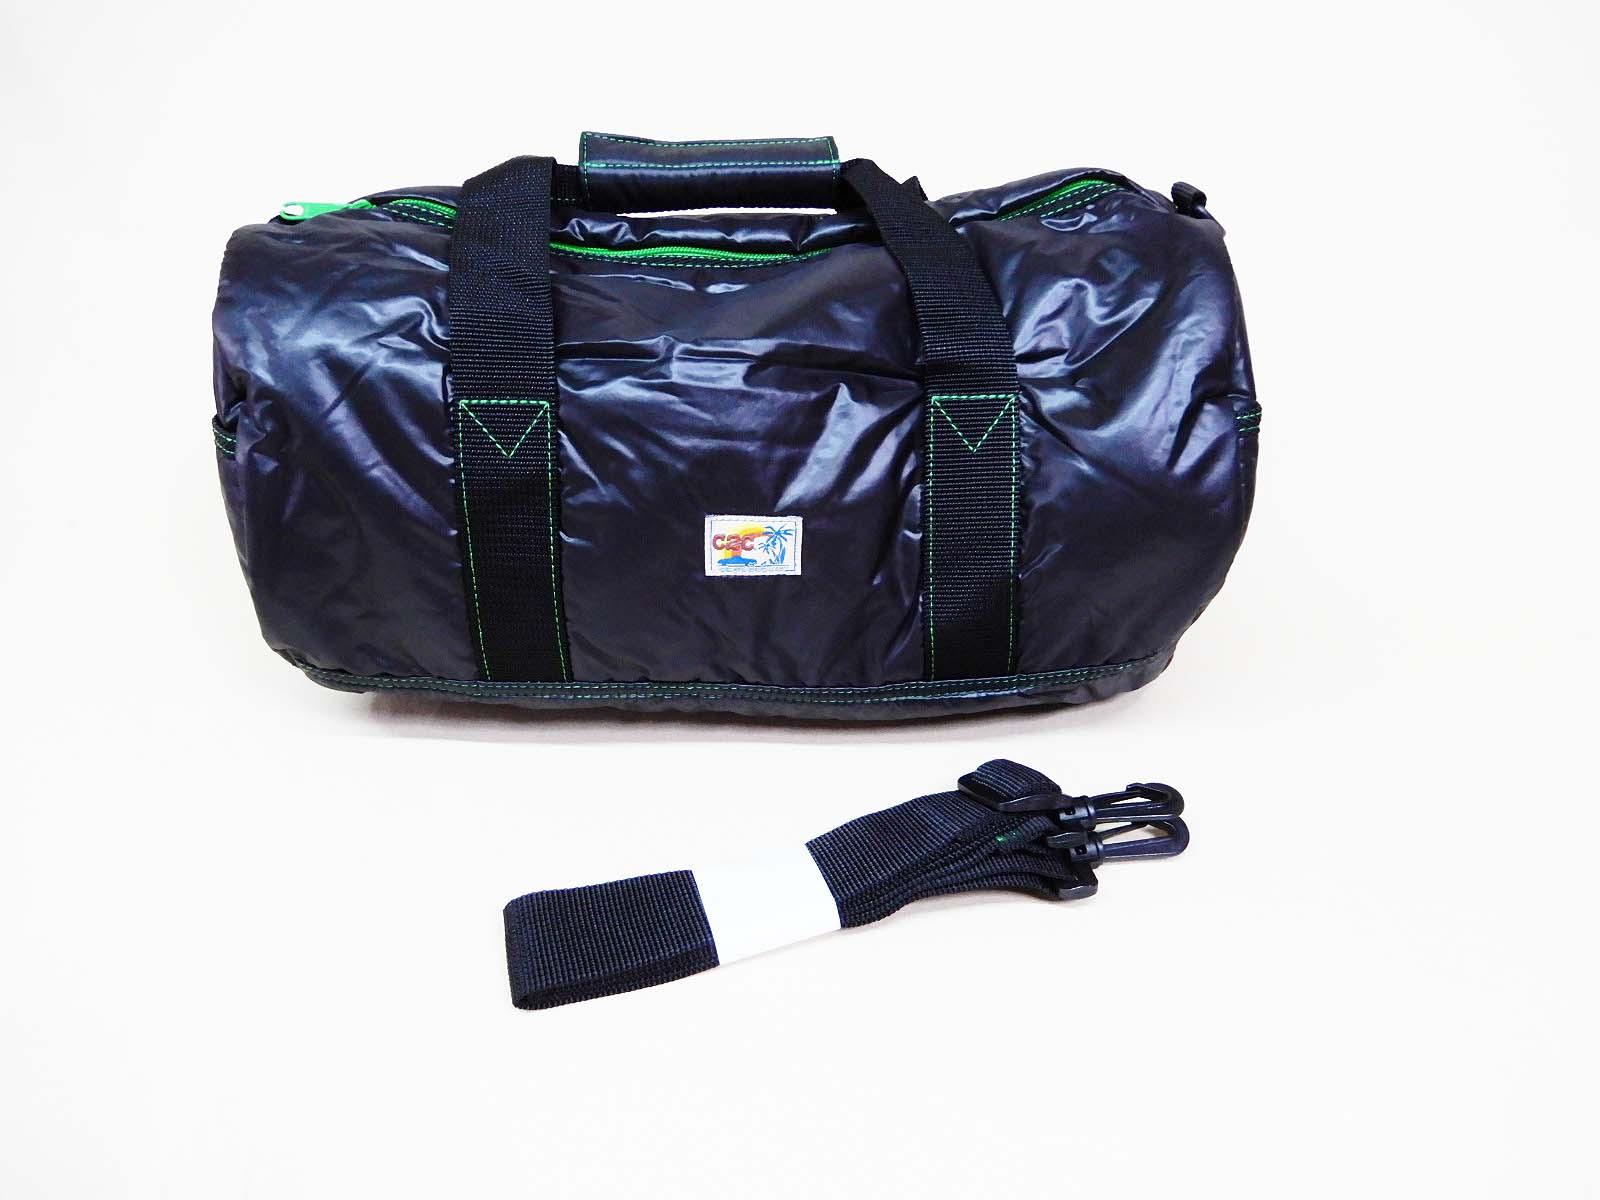 COAST 2 COAST ドラムバック『ブラックxグリーン』パラシュート生地使用 軽量 旅行 小旅行 普段使い お出かけ ピクニック 行楽 スポーツ